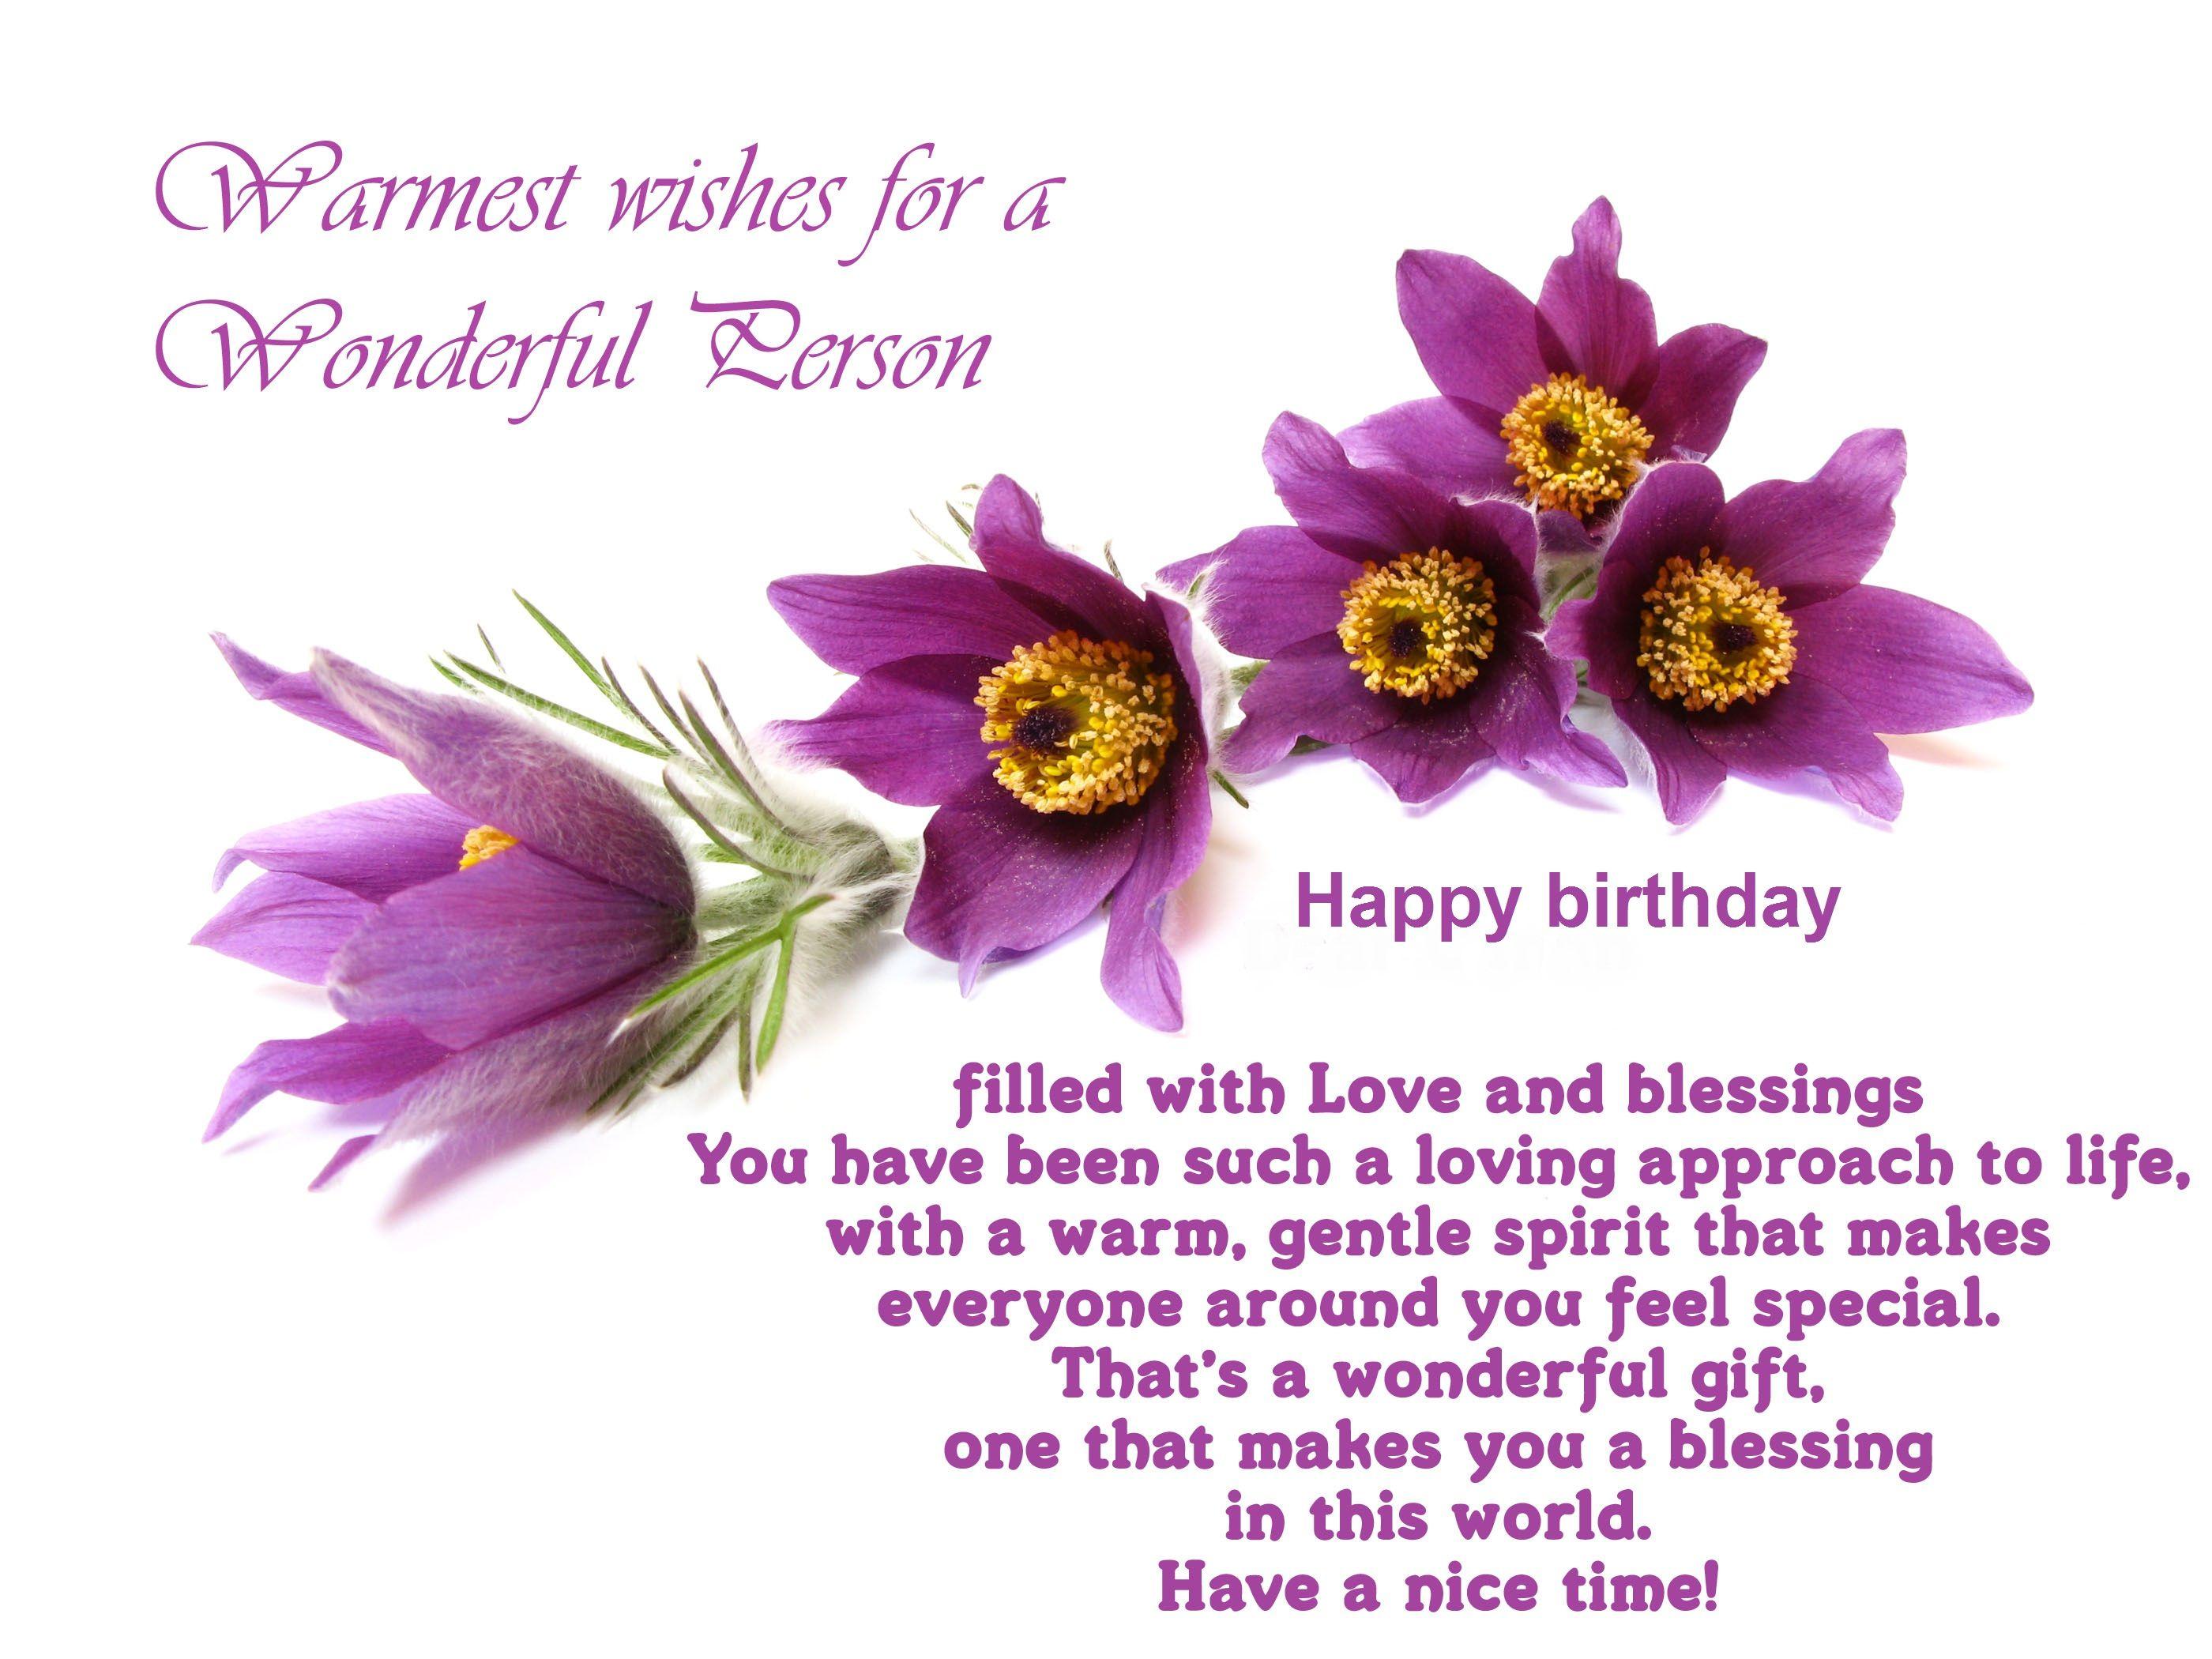 54 best happy birthday wishes images on pinterest happy birthday warmest wishes for a wonderful person happy birthday friend izmirmasajfo Choice Image